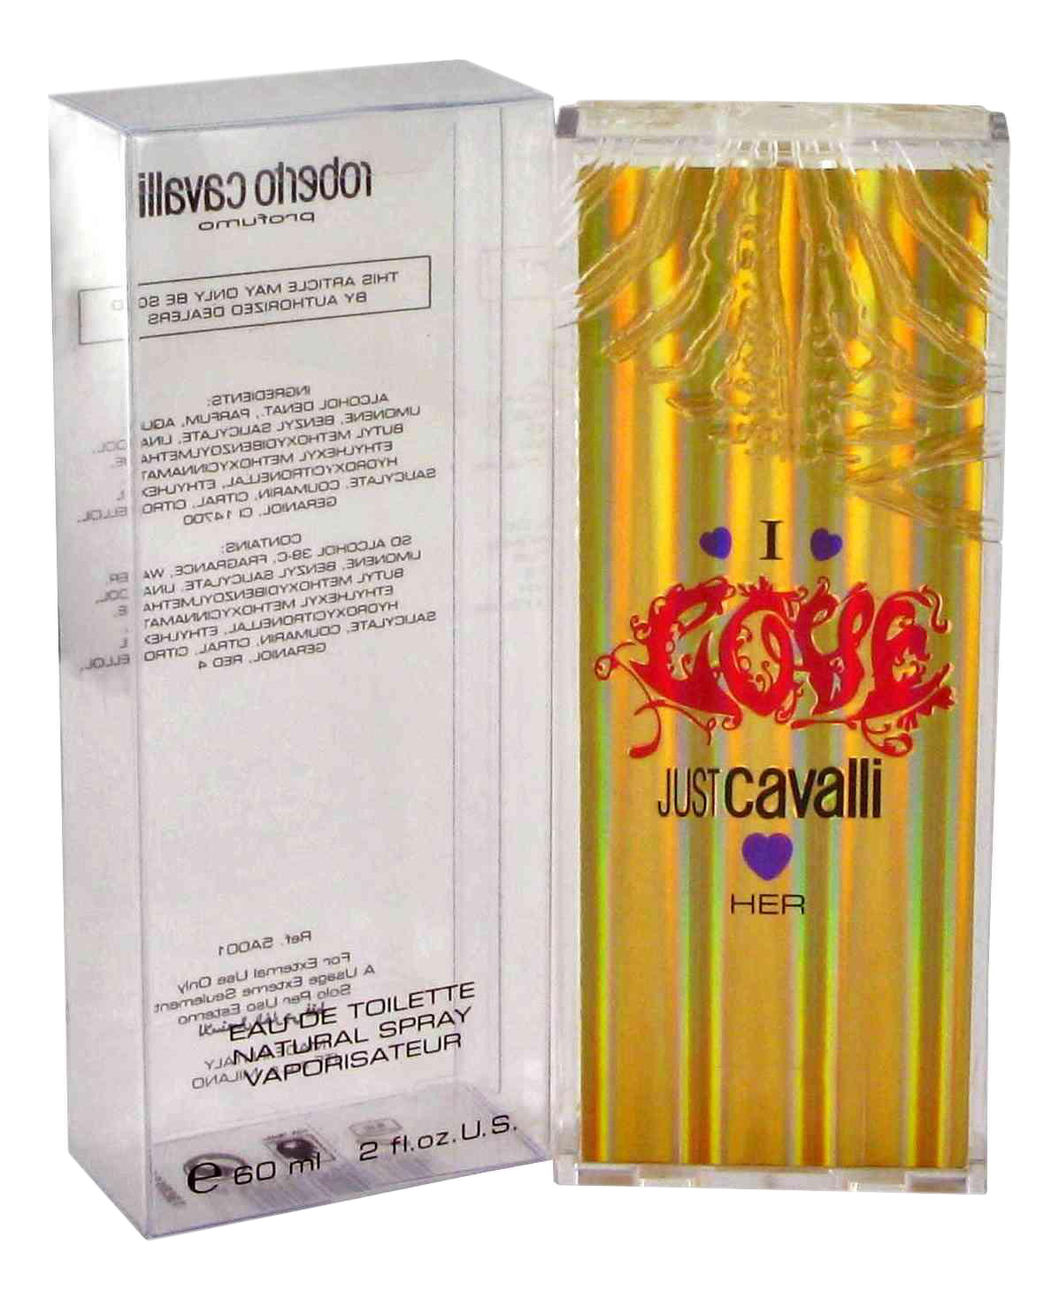 цена Roberto Cavalli Just Cavalli I Love Her: туалетная вода 60мл онлайн в 2017 году